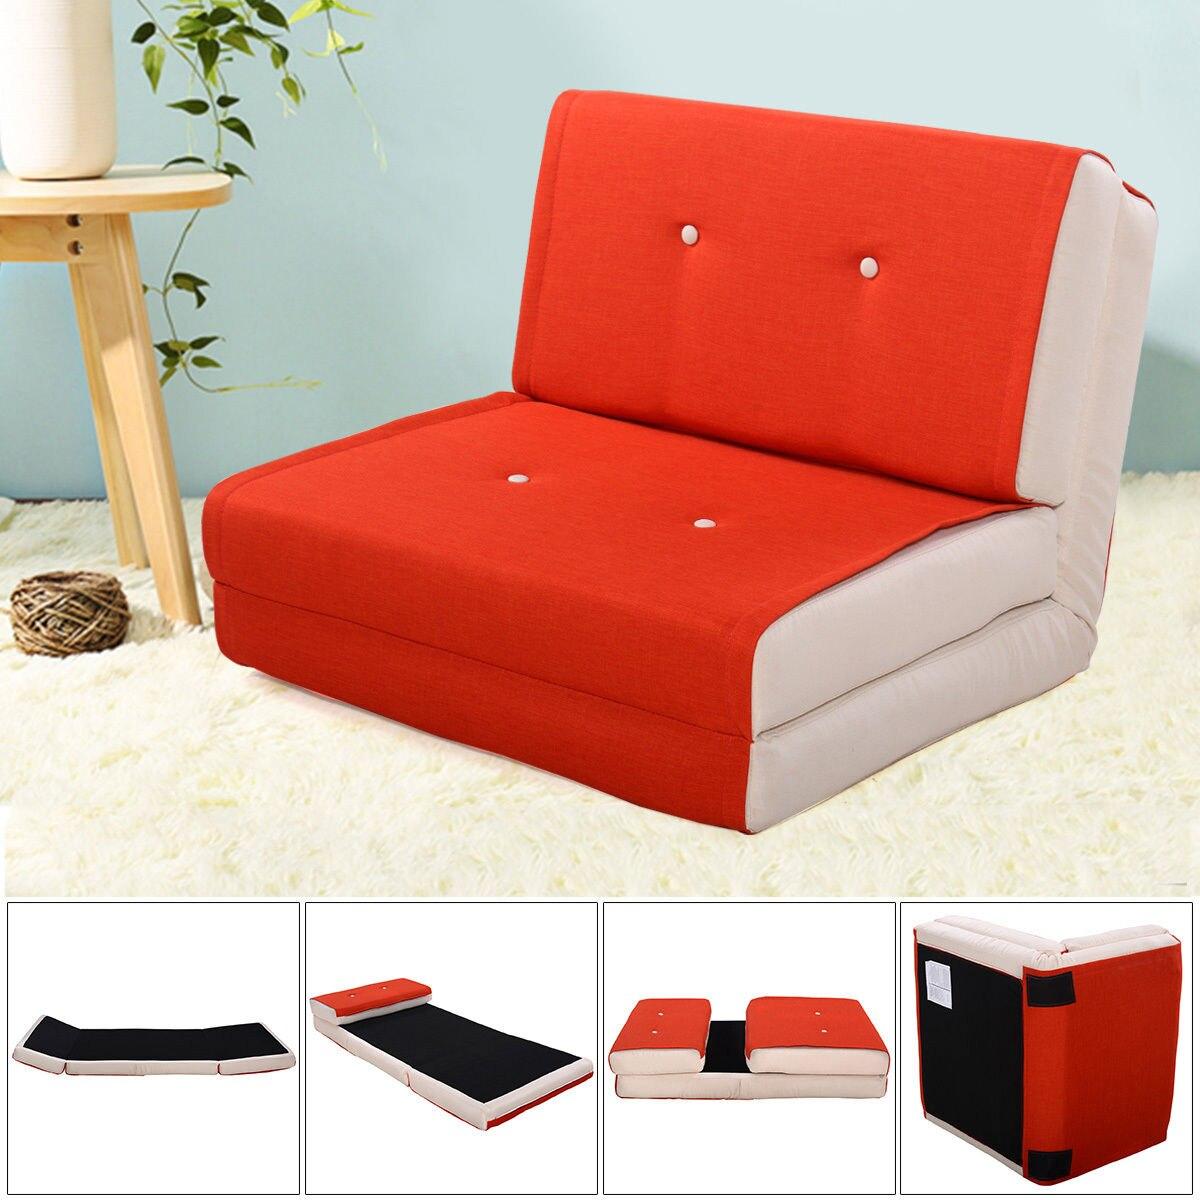 Giantex Folding Sofa Bed Modern Convertible Split Back Linen Futon Lovesear Sofa Chair Living Room Couch Recliner HW52681DKRE